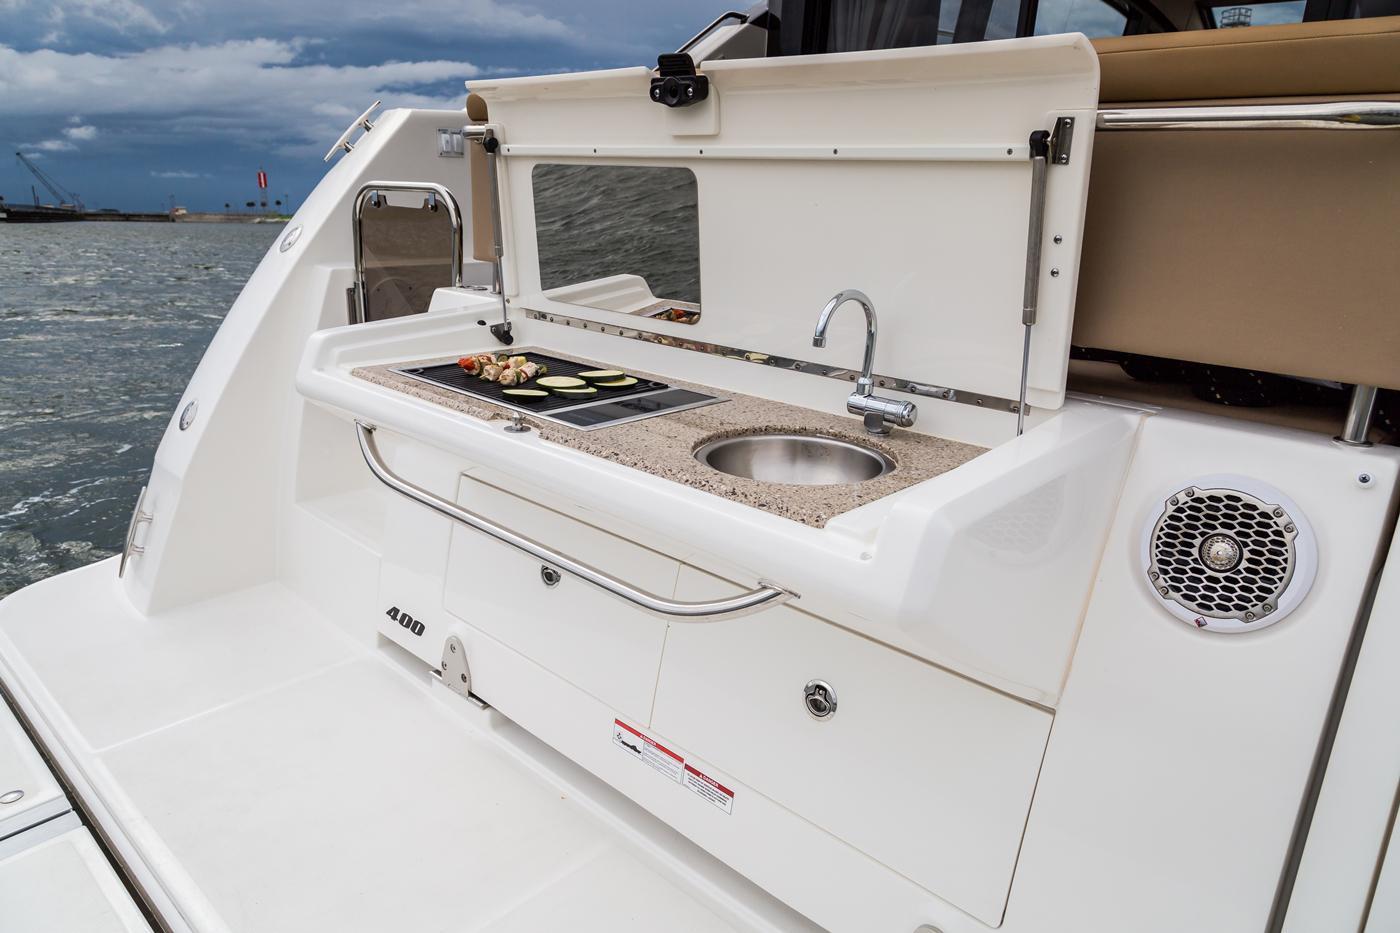 Boats Sea Ray Fuse Box Schematic Diagrams Seadoo Gtx 2018 Sundancer 400 For Sale In St Clair Shores Mi Colony